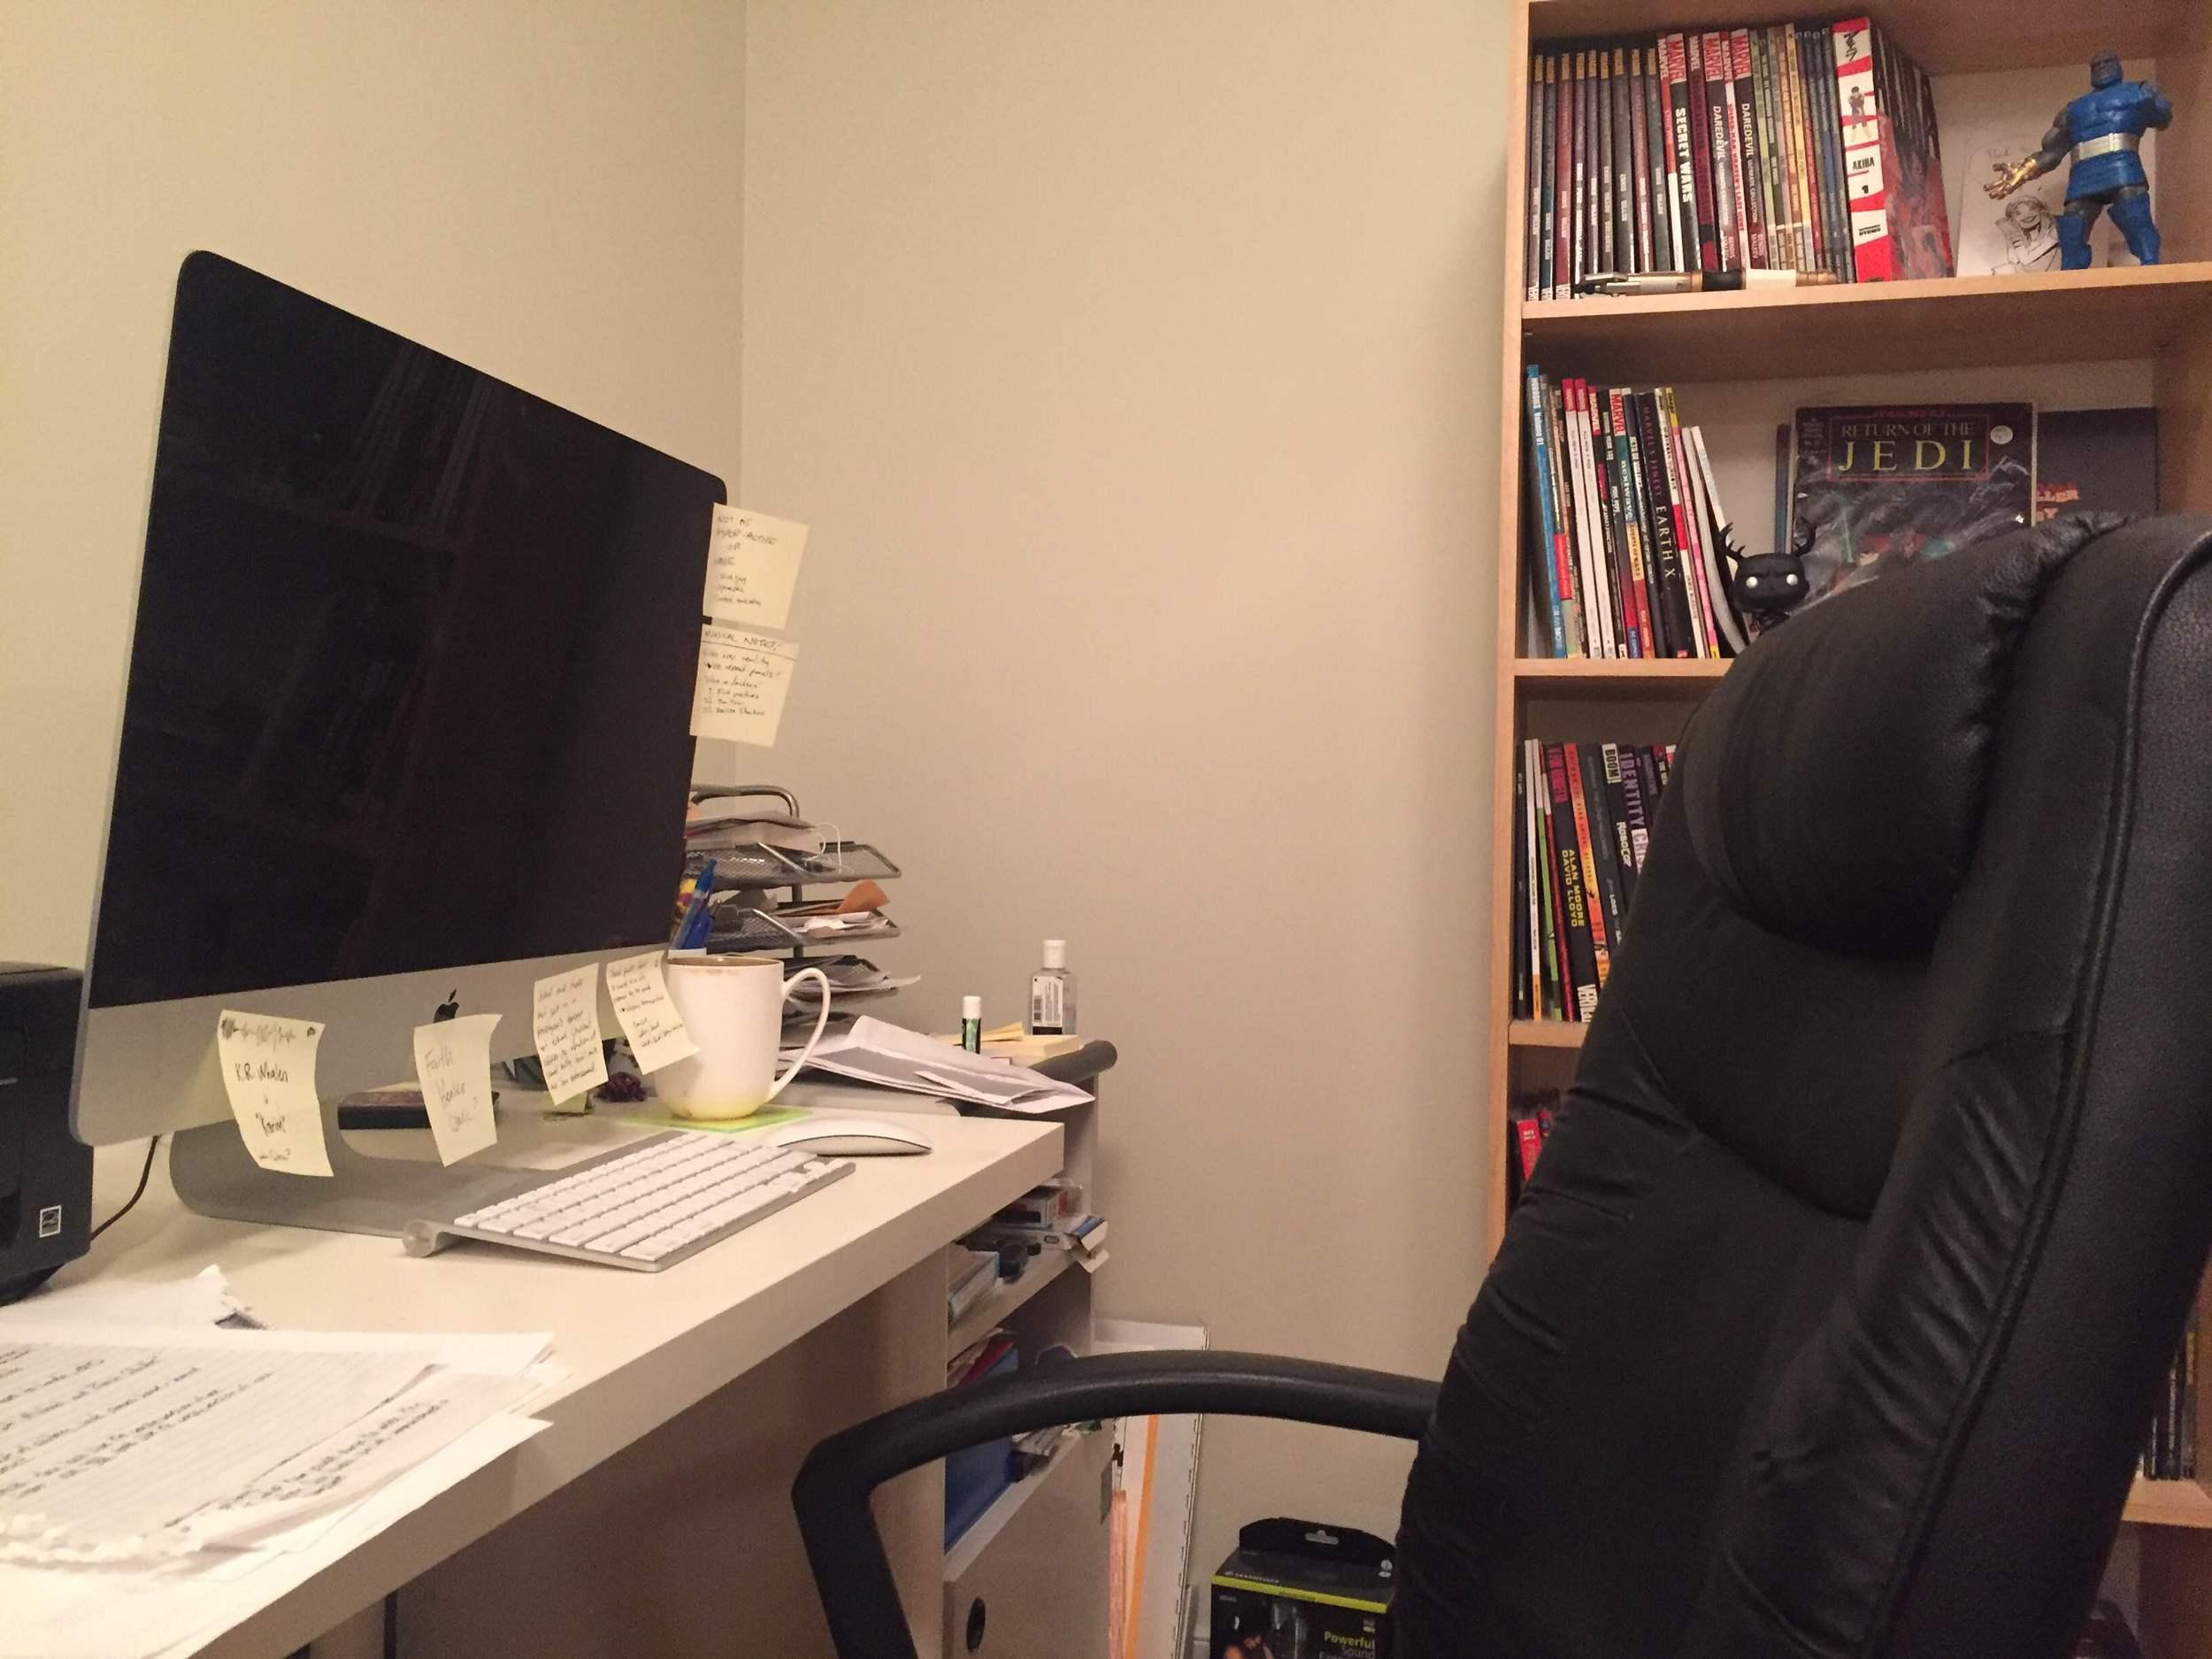 Ryan's work space overseen by lord  Darkseid